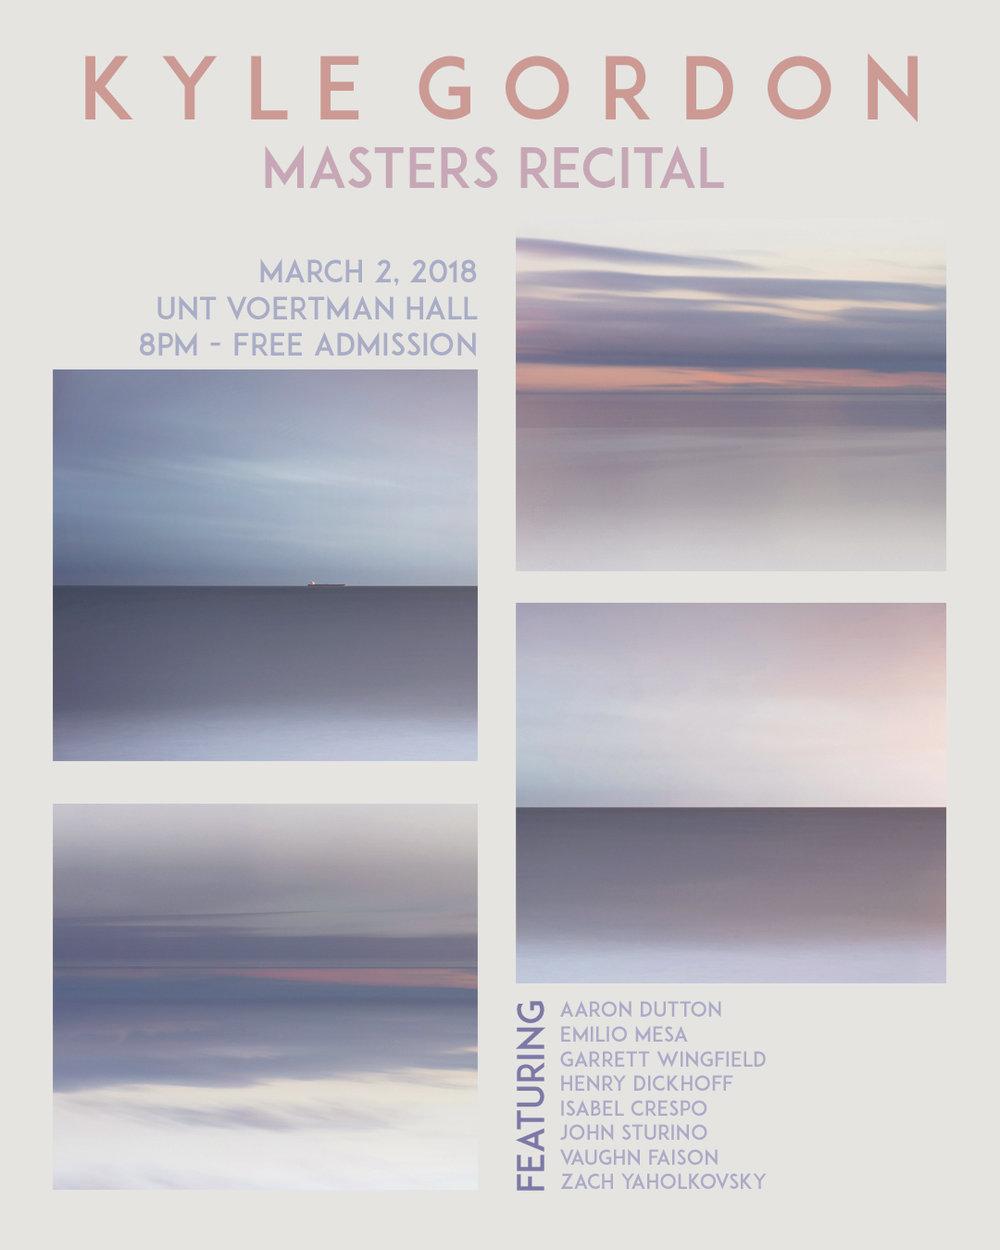 Kyle Gordon Masters Recital 03.02.18 IG SIZED POSTER.jpg